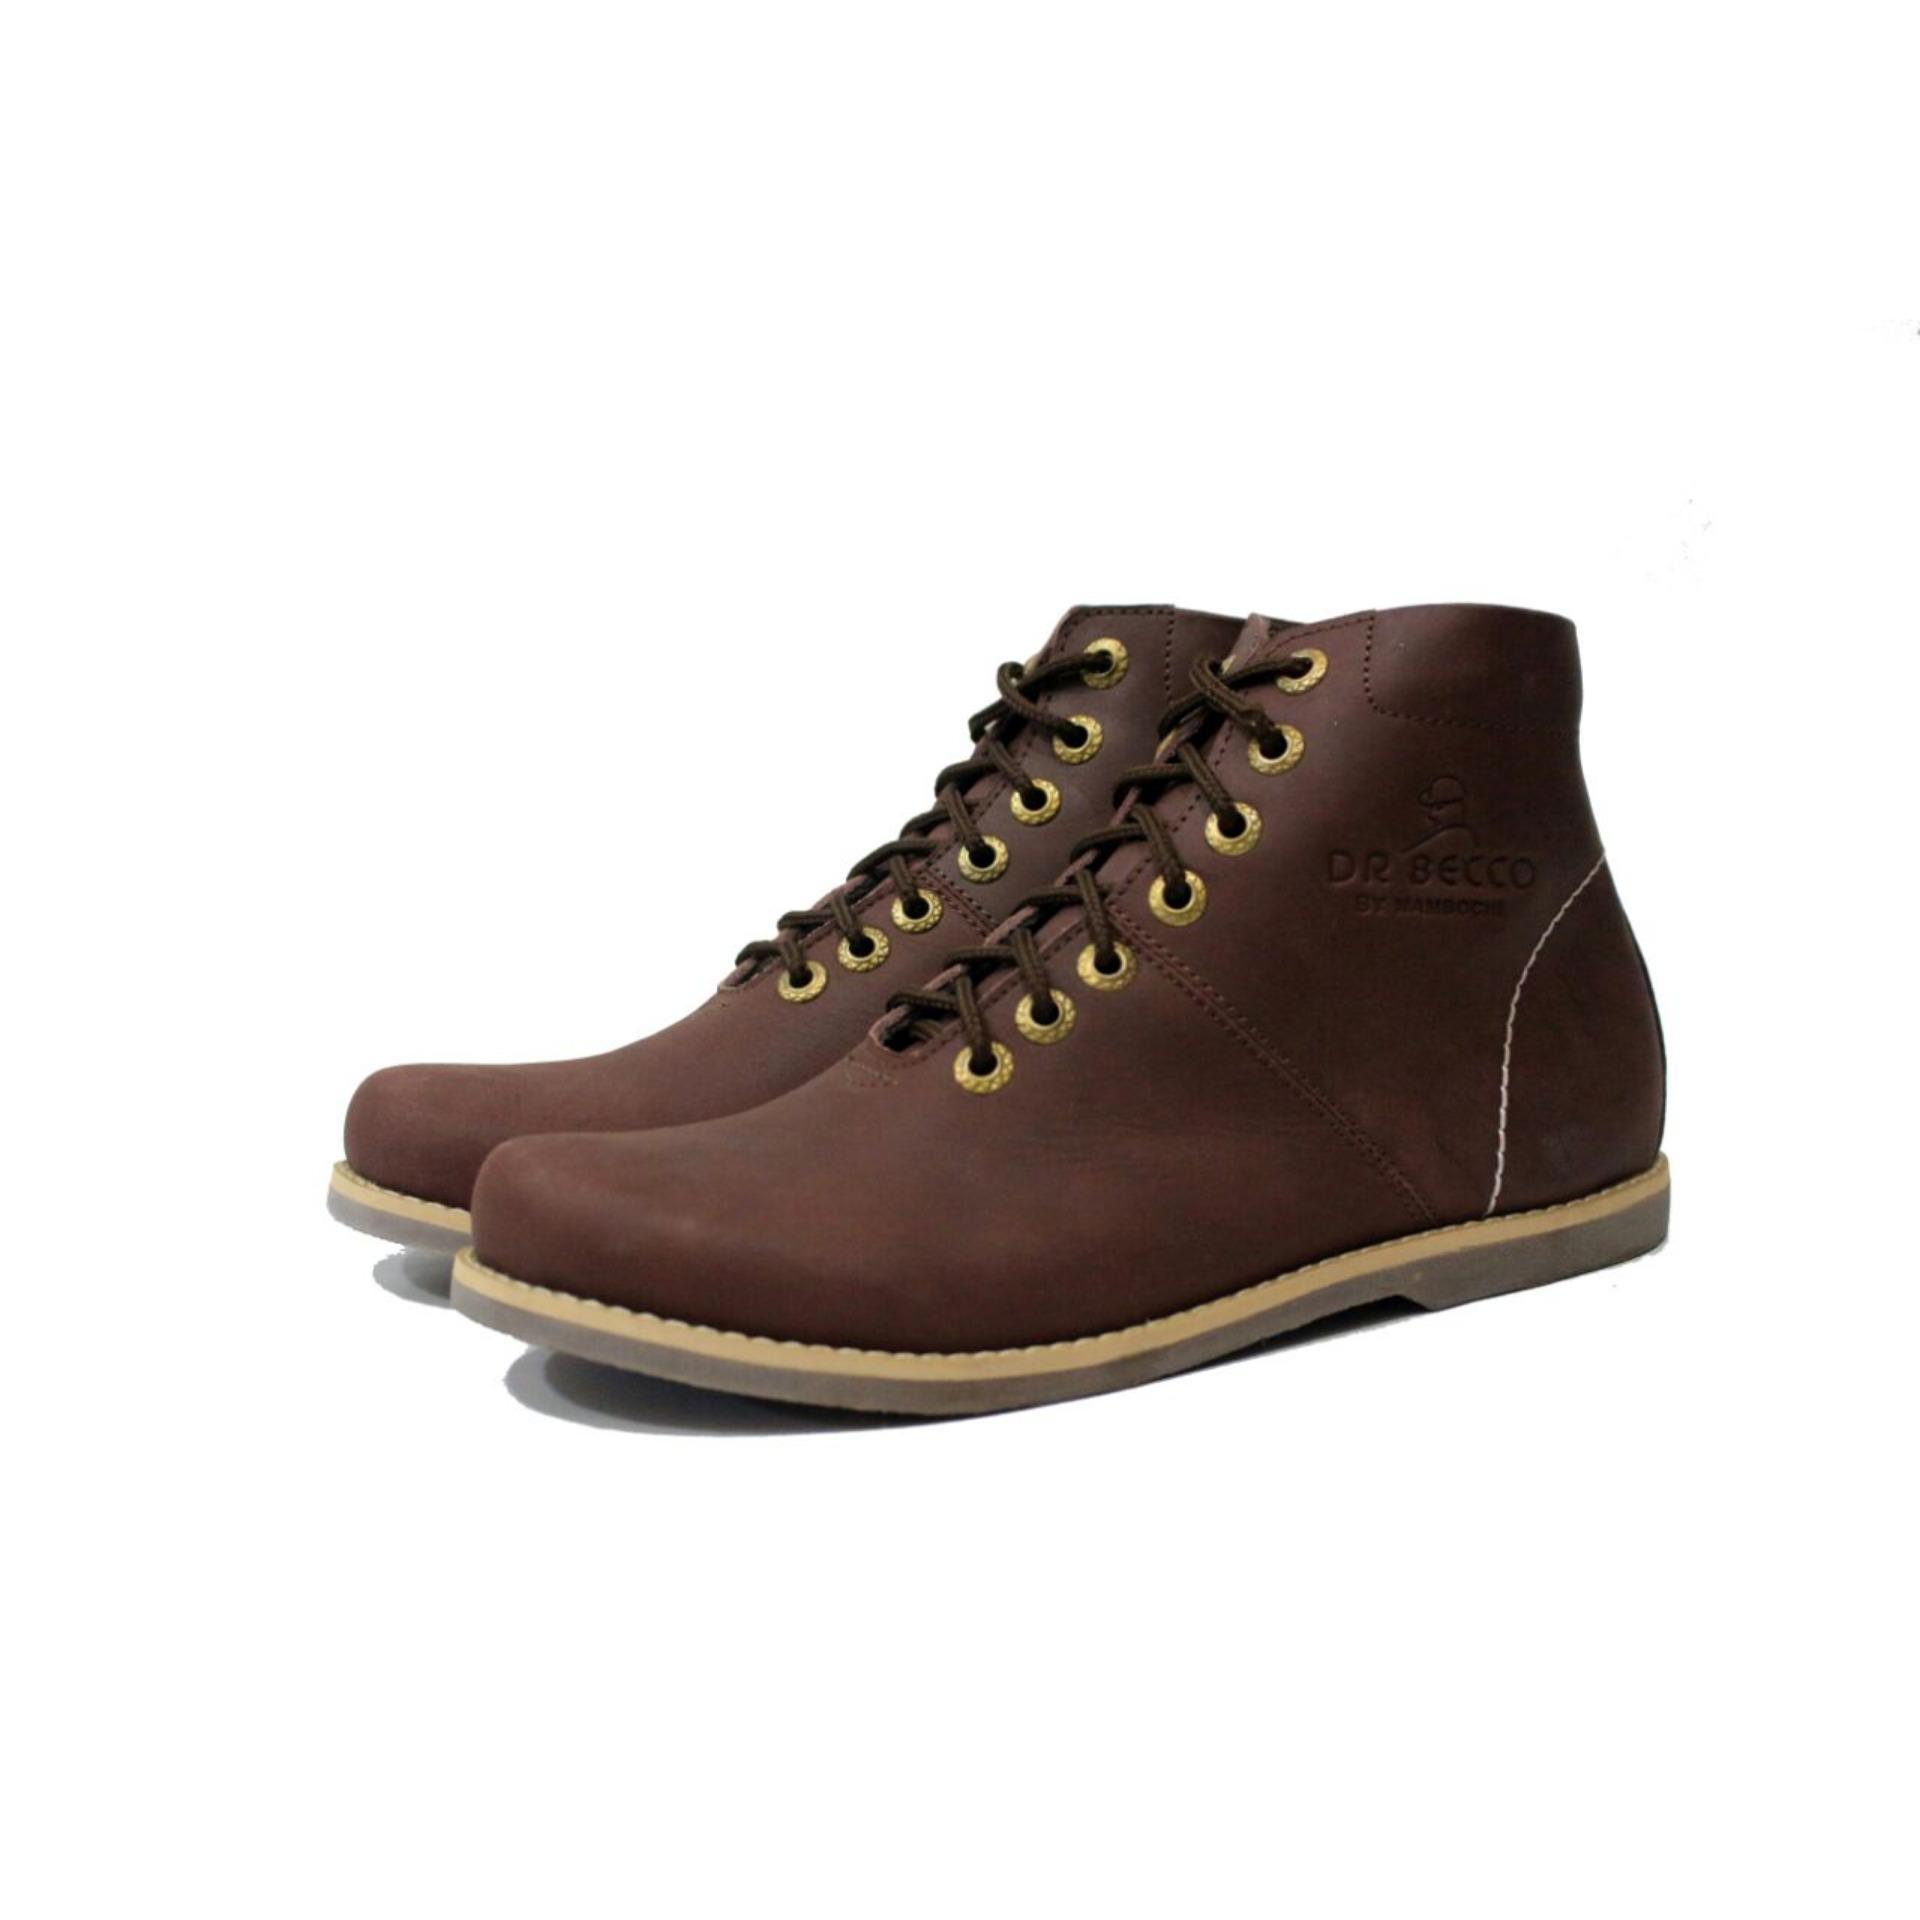 Azkashoes Sepatu Wanita Slip On Eagle Dr24 Ungu - Wikie Cloud Design ... 44c644c549